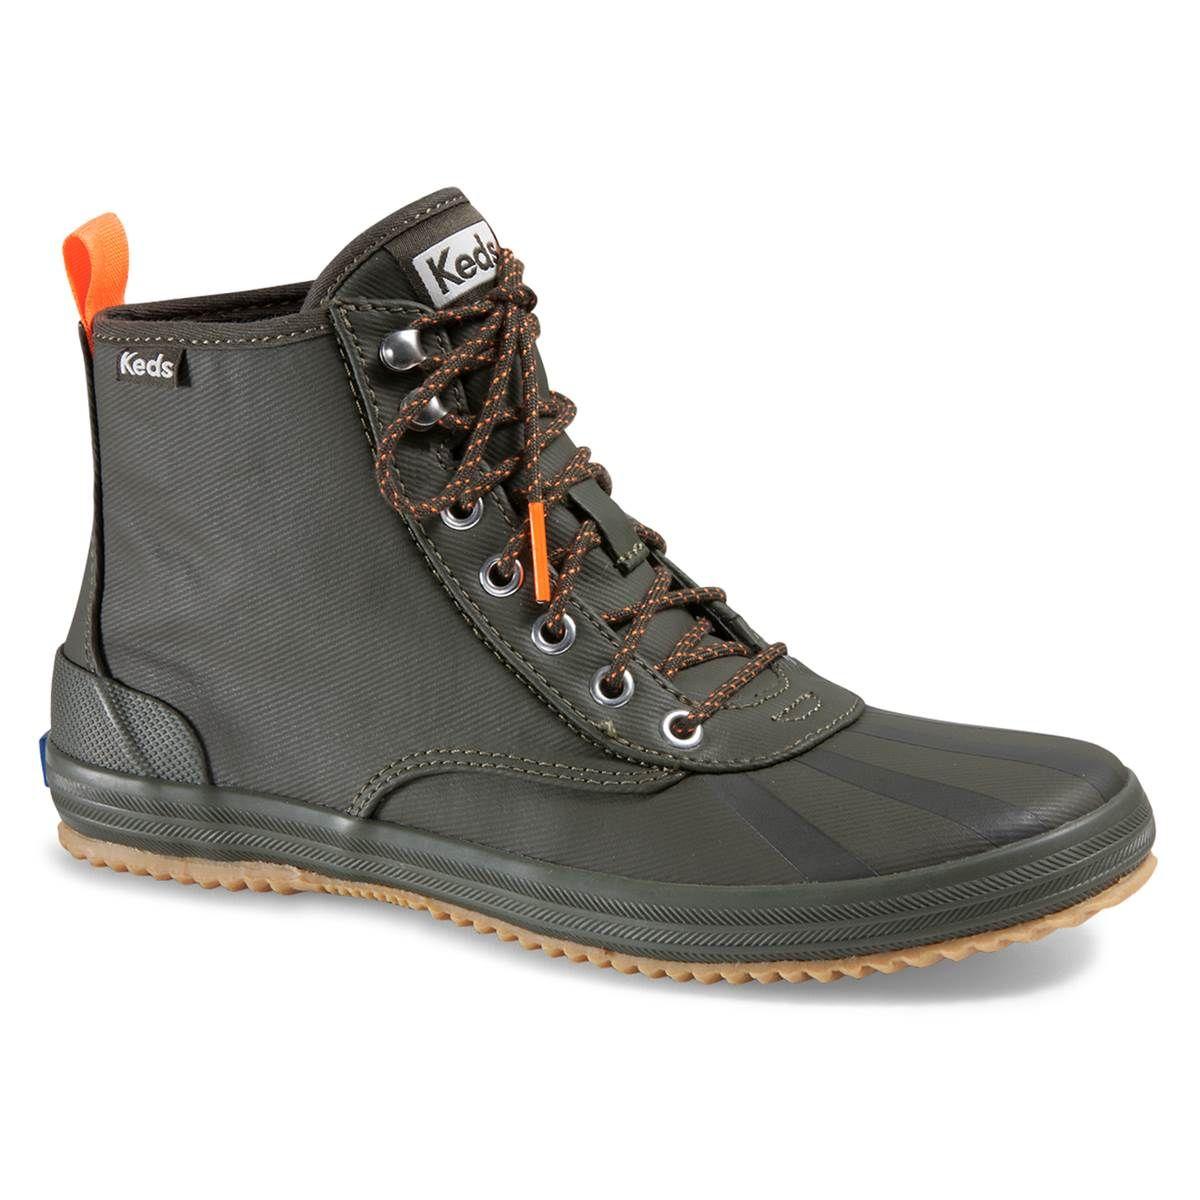 59840d555d5a Keds Women s Scout Splash WX Boot